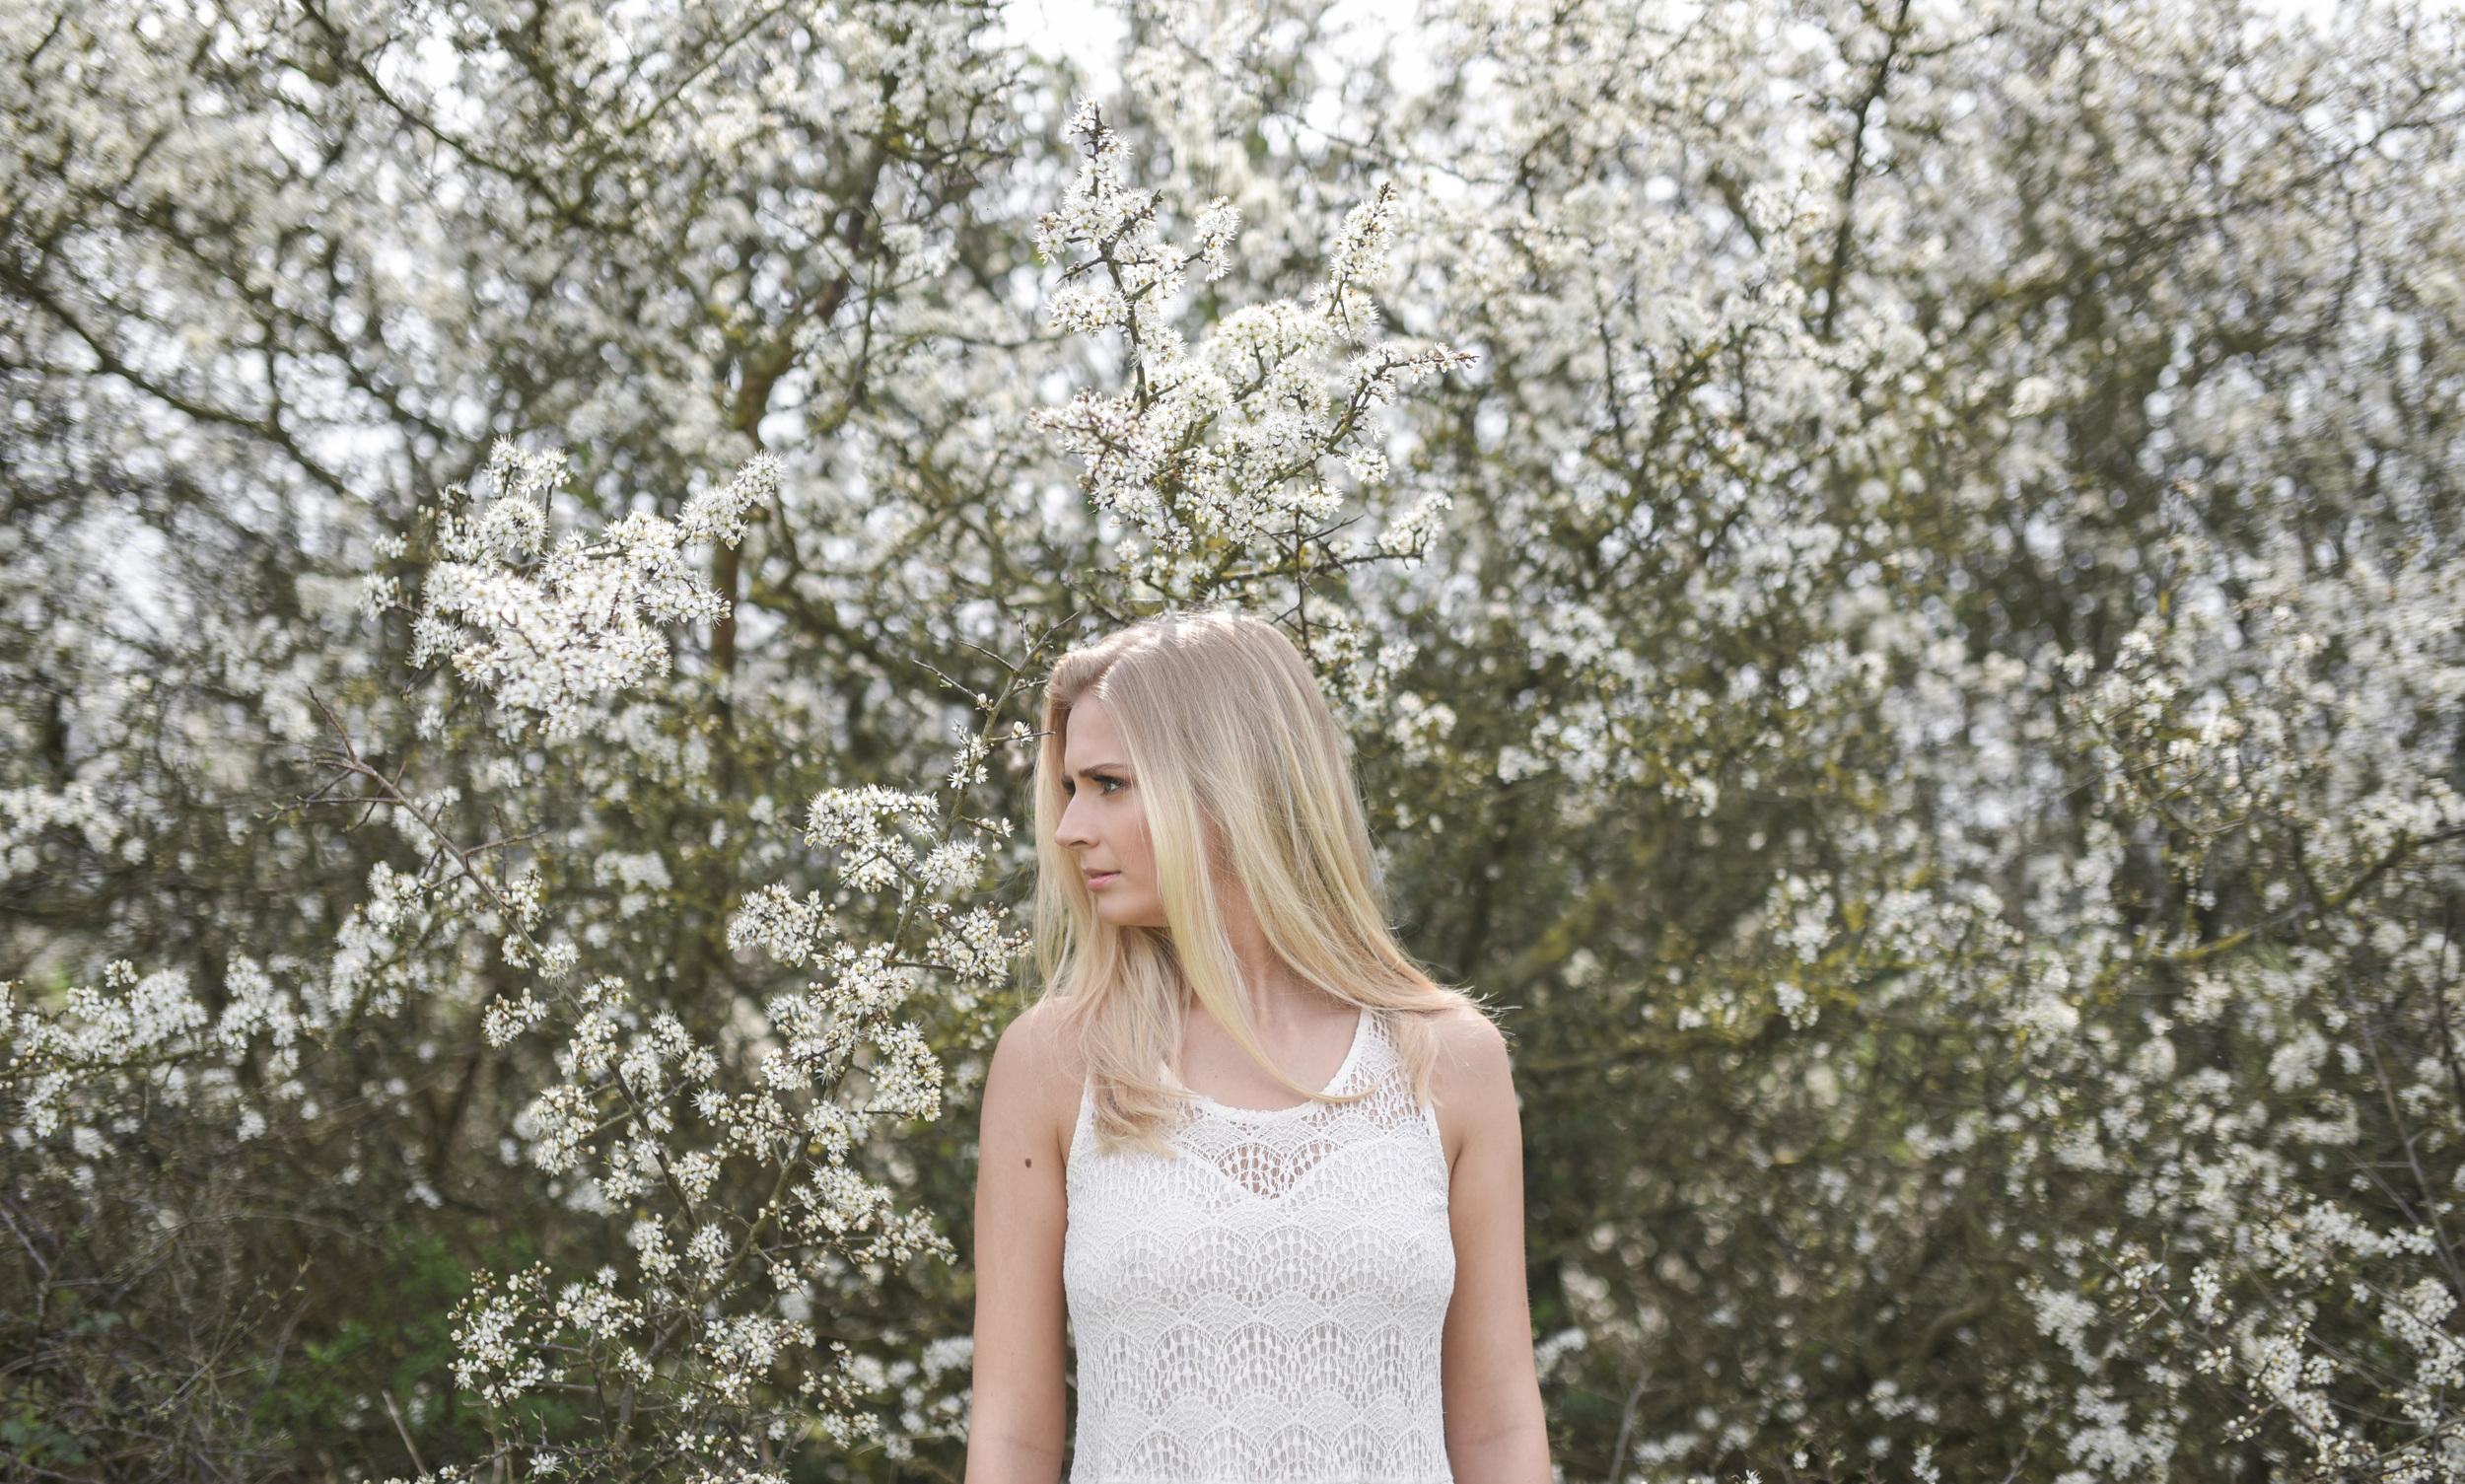 Tara-Florence-Photography-Spring-Bloom-4.jpg